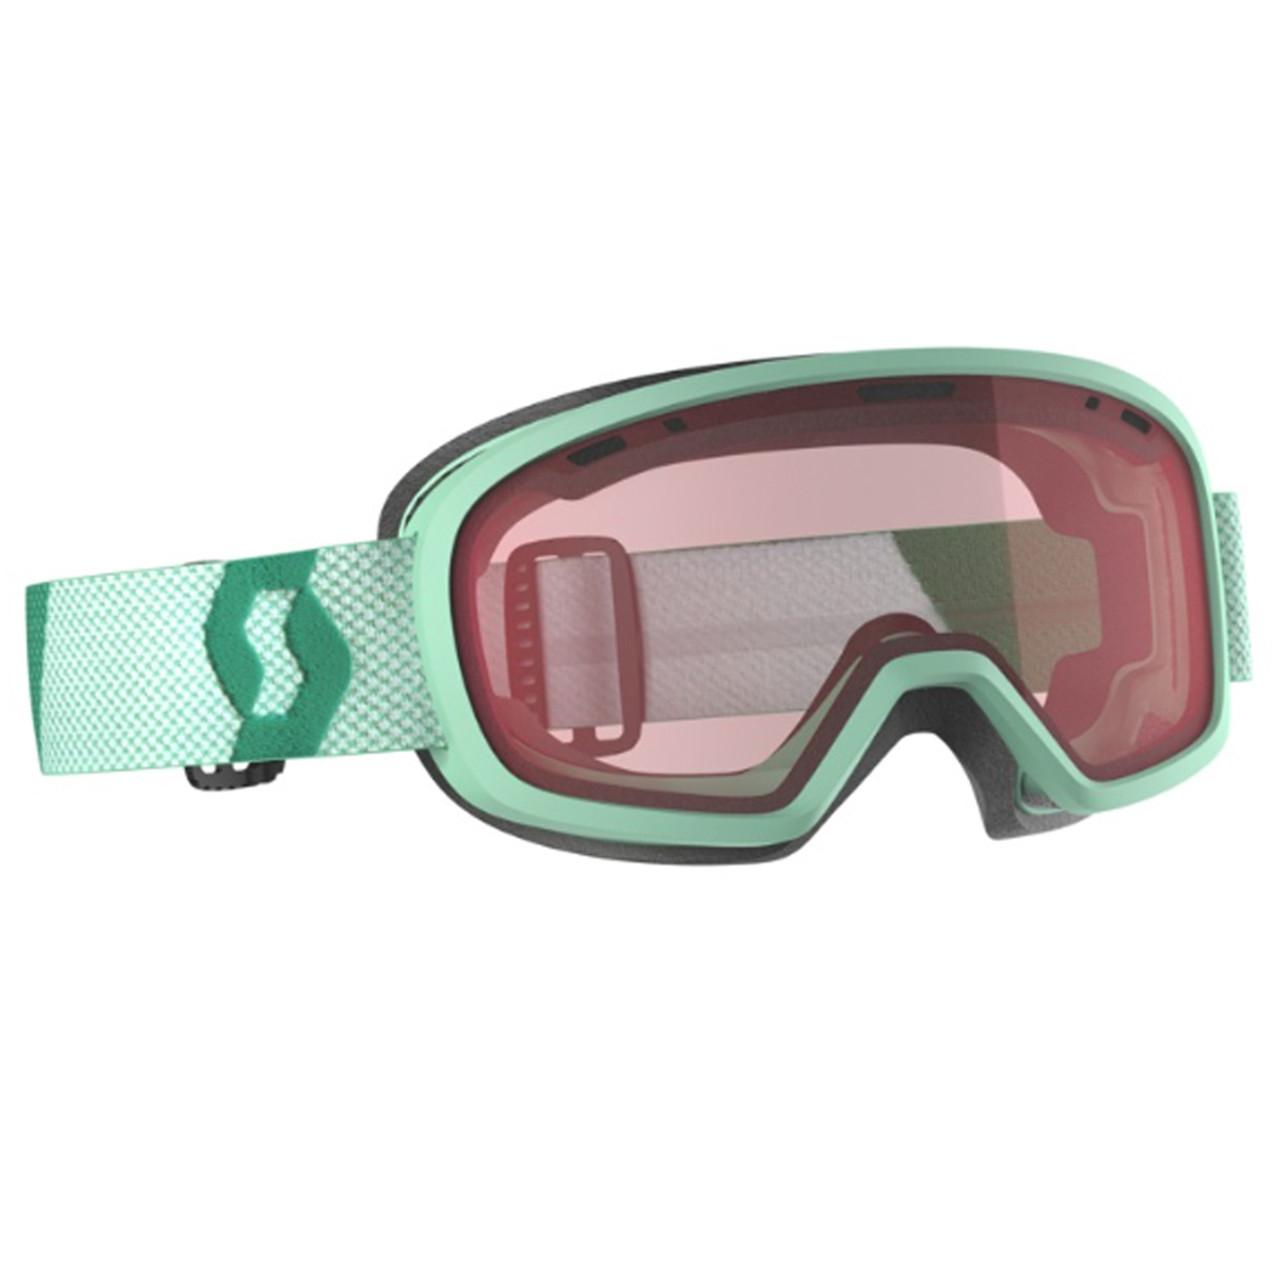 f58dce02c6e2 Scott Muse Pro Ski   Snowboard Goggles - Various Lens